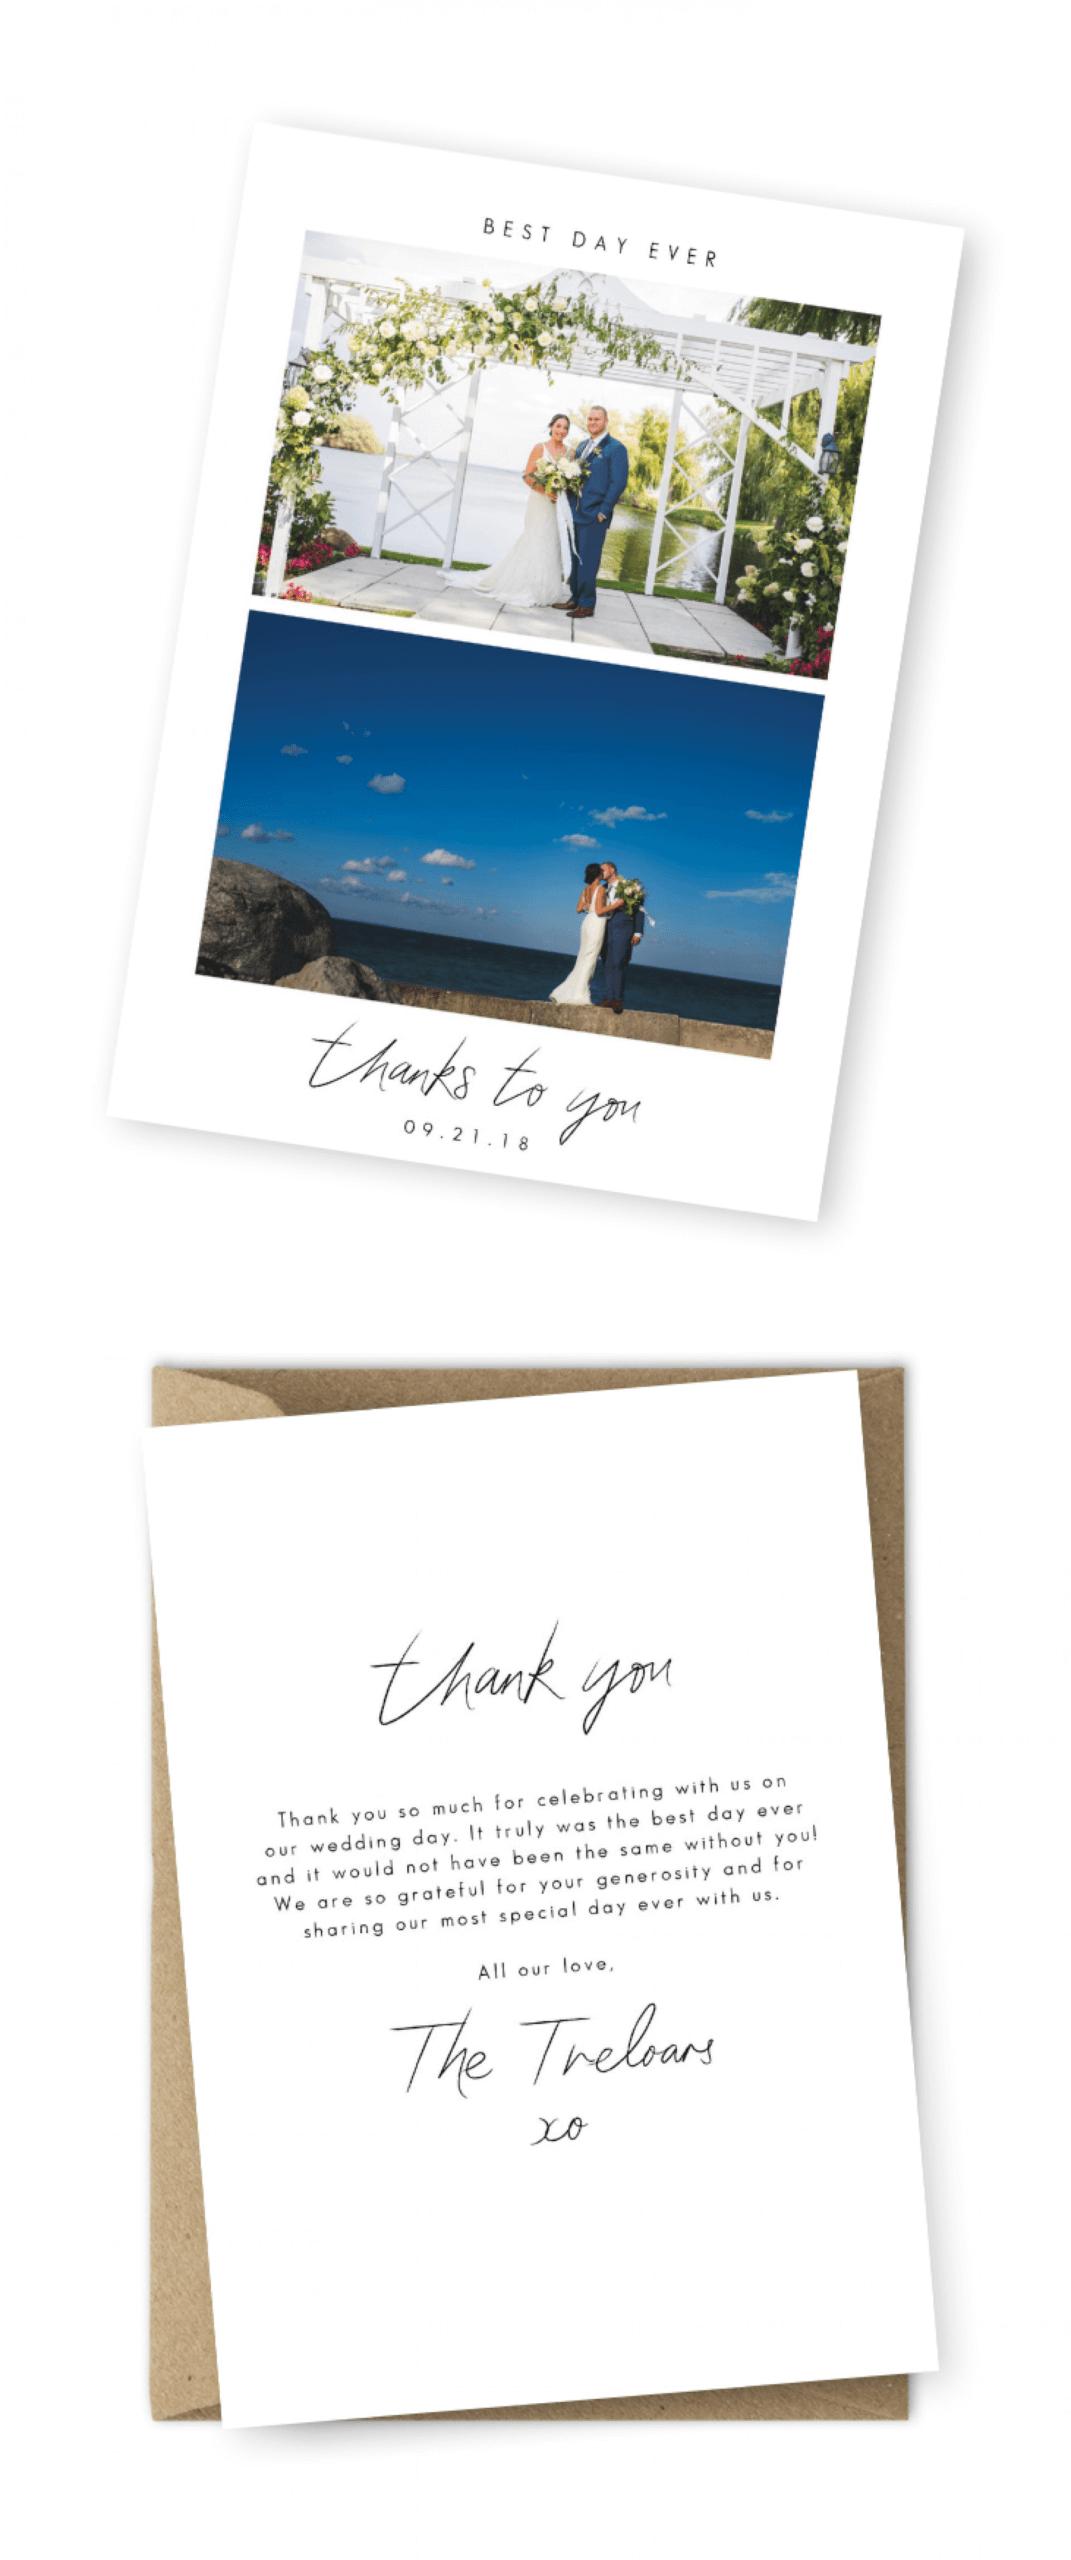 005 Wedding Thank You Card Wording Message Ideas Template In Template For Wedding Thank You Cards